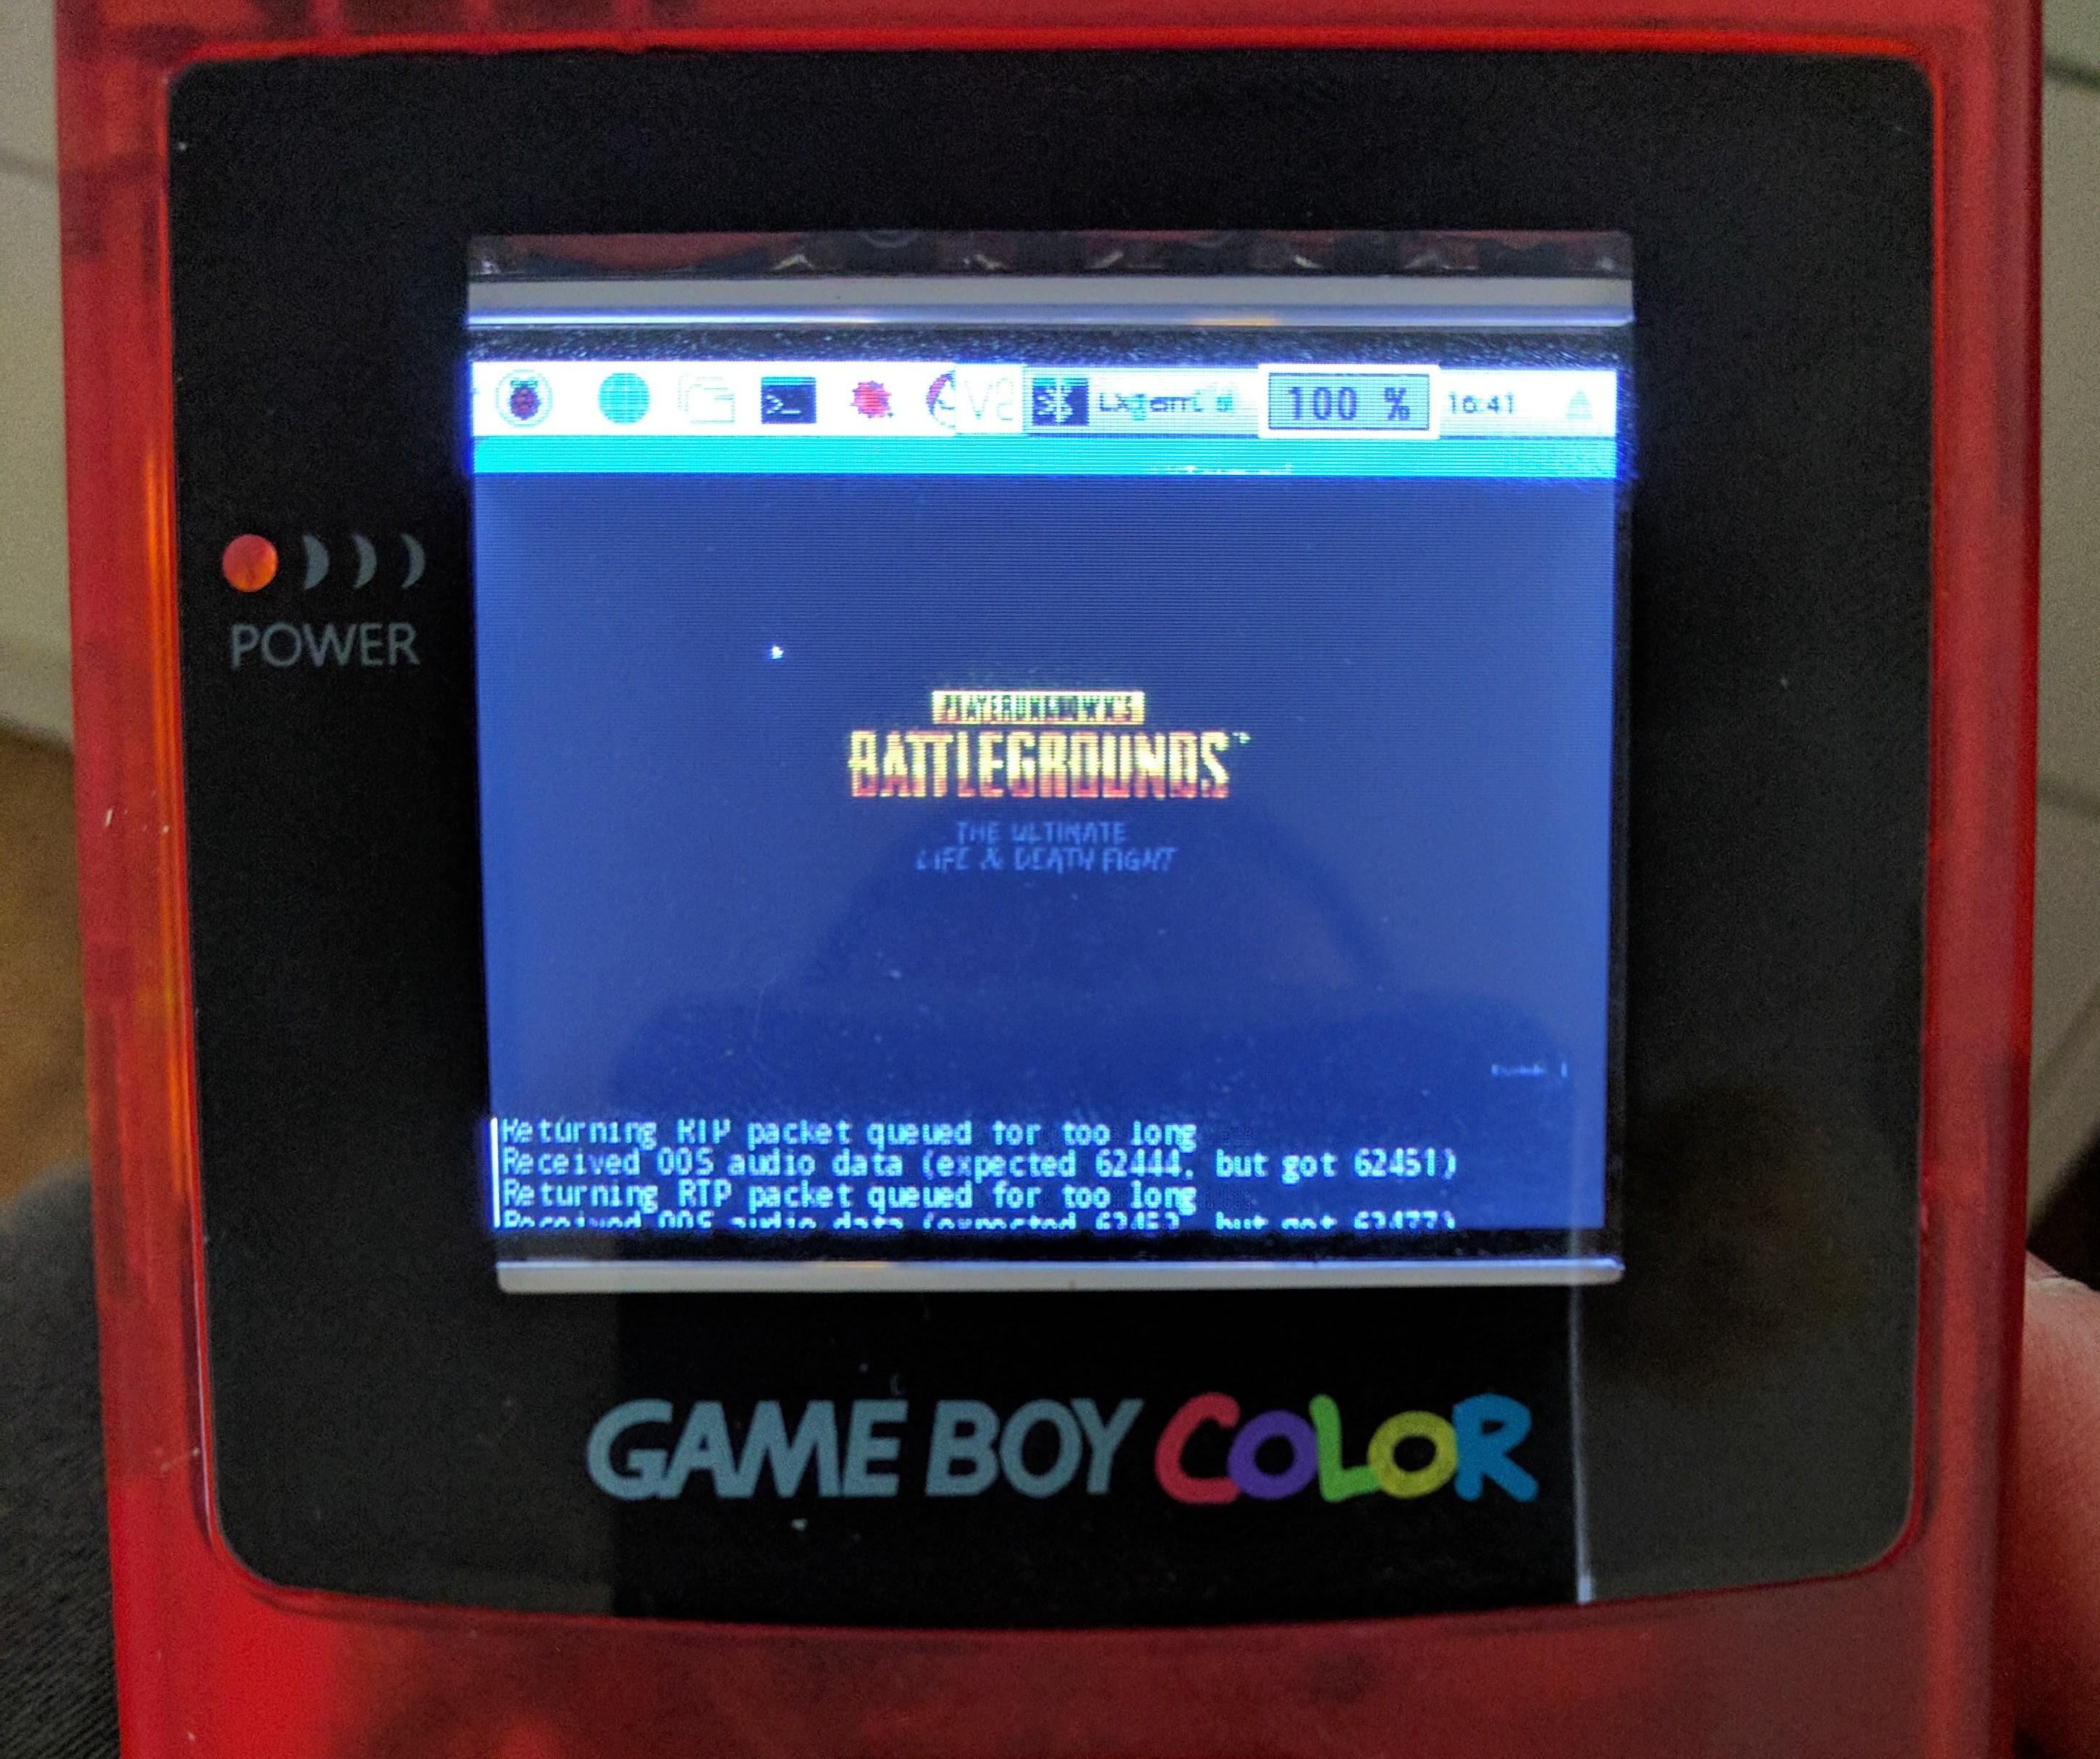 PlayerUnknown's Battlegrounds Raspberry Pi